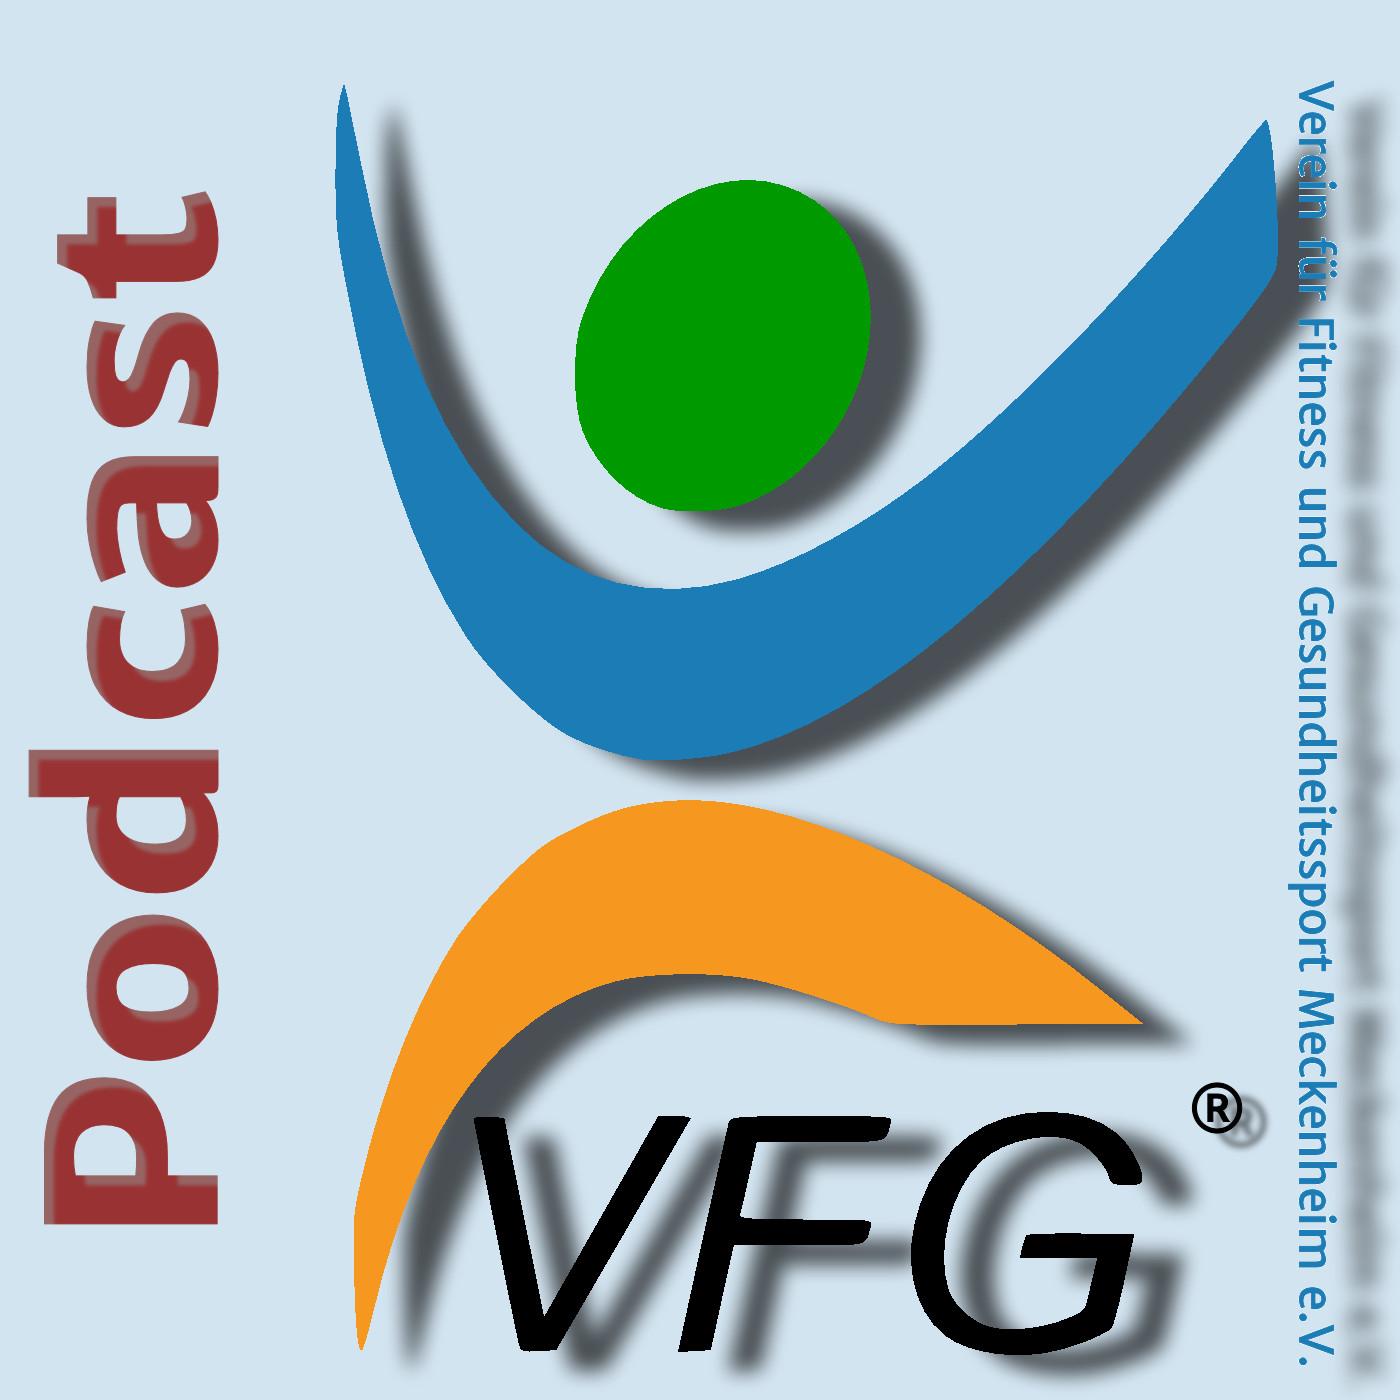 VFG Meckenheim - Podcast Channel